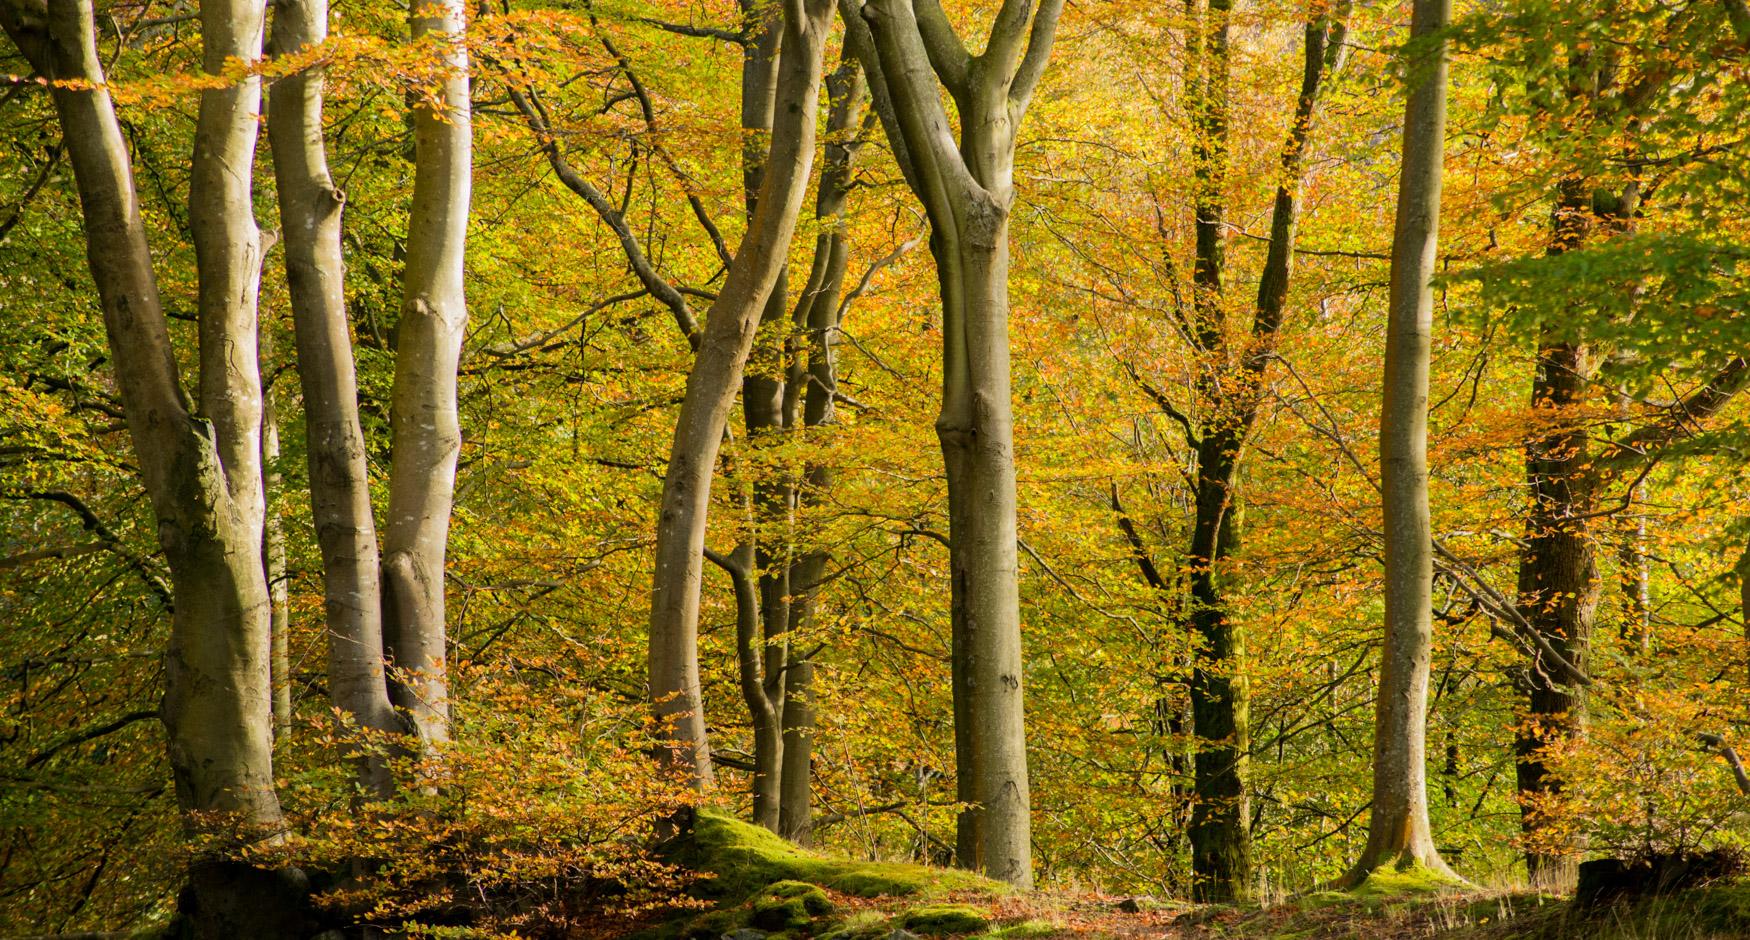 Penny Rock woods near Grasmere in Autumn